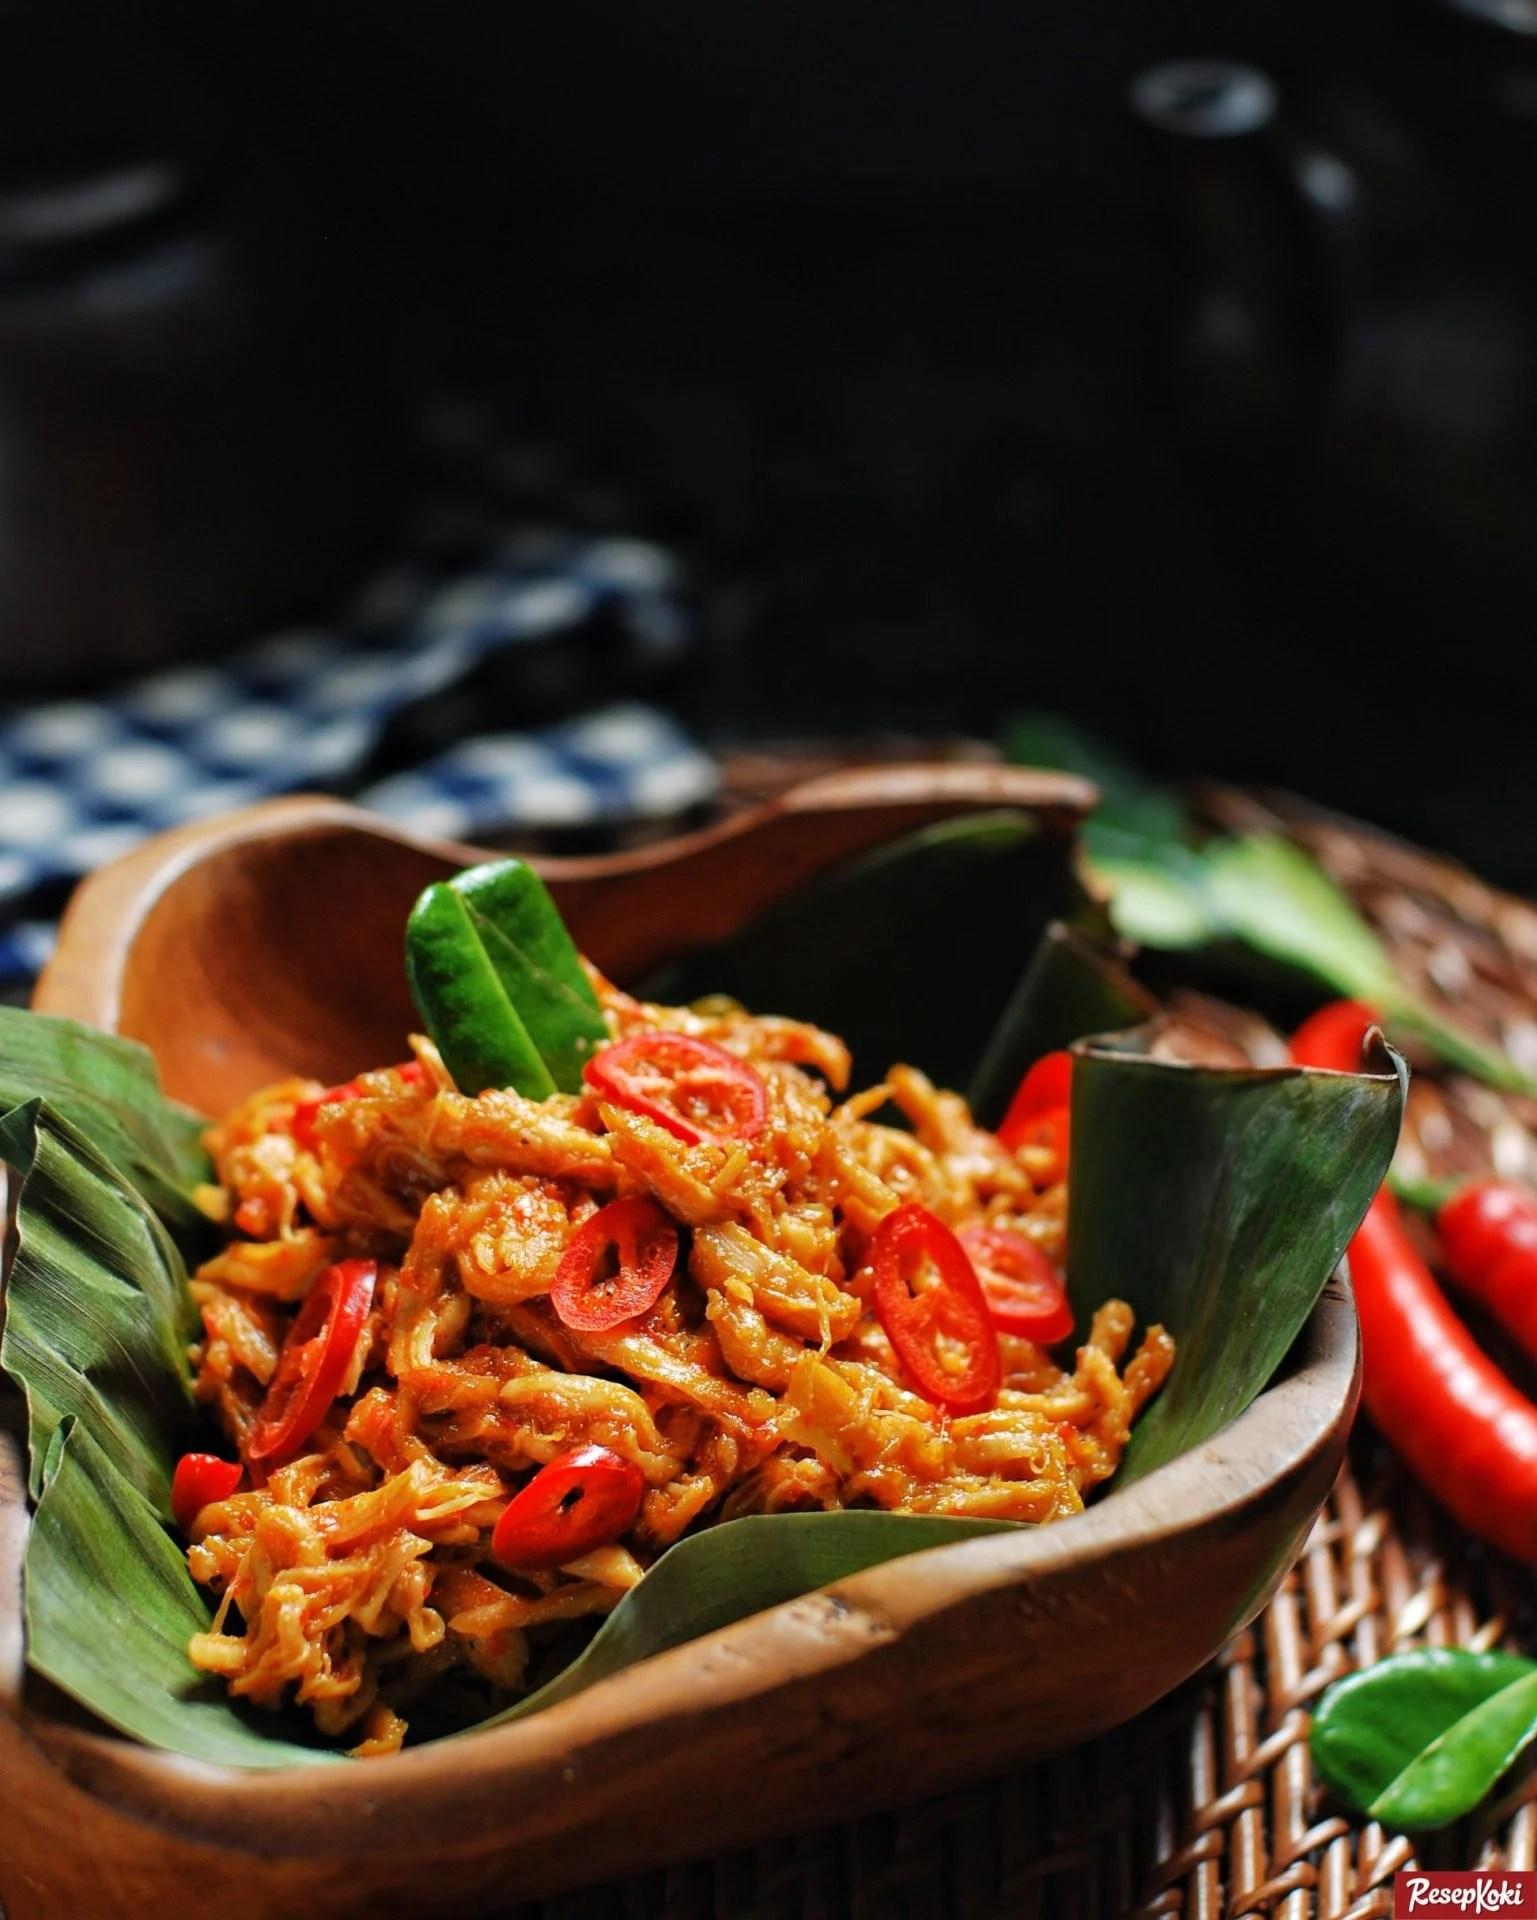 Kenalin 7 Resep Masakan Bali Terpopuler Wajib Coba Resepkoki